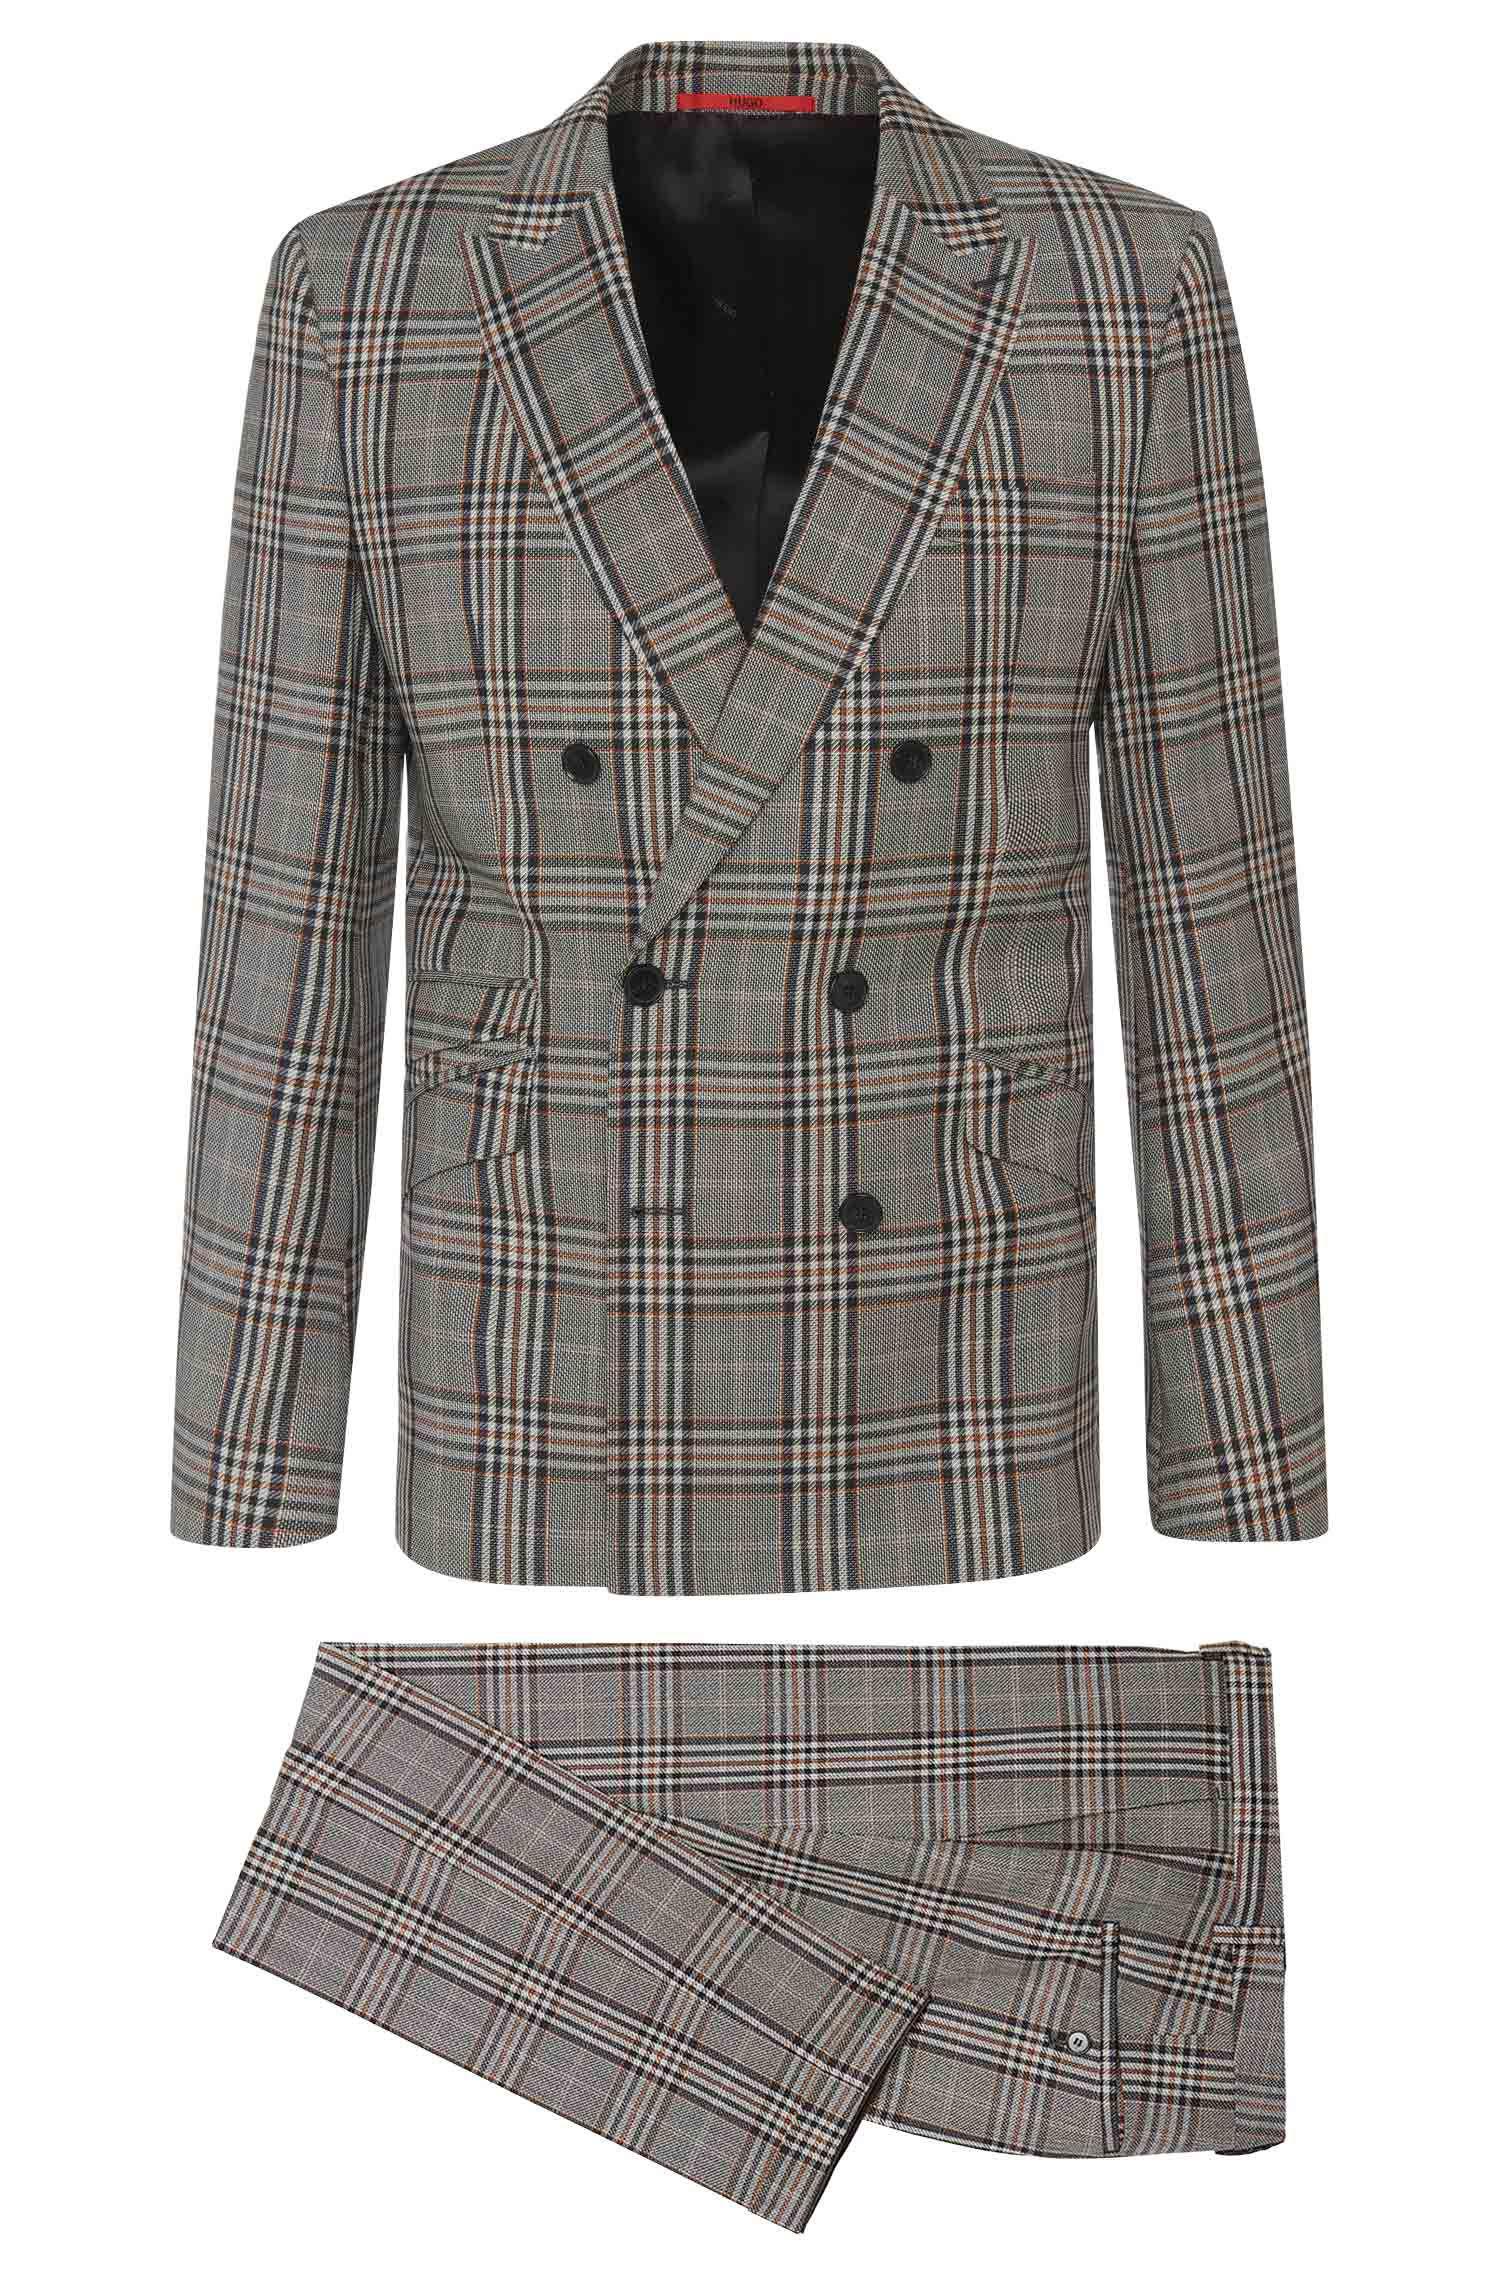 Plaid Virgin Wool Double-Breasted Suit, Slim Fit | Allin/Harlith